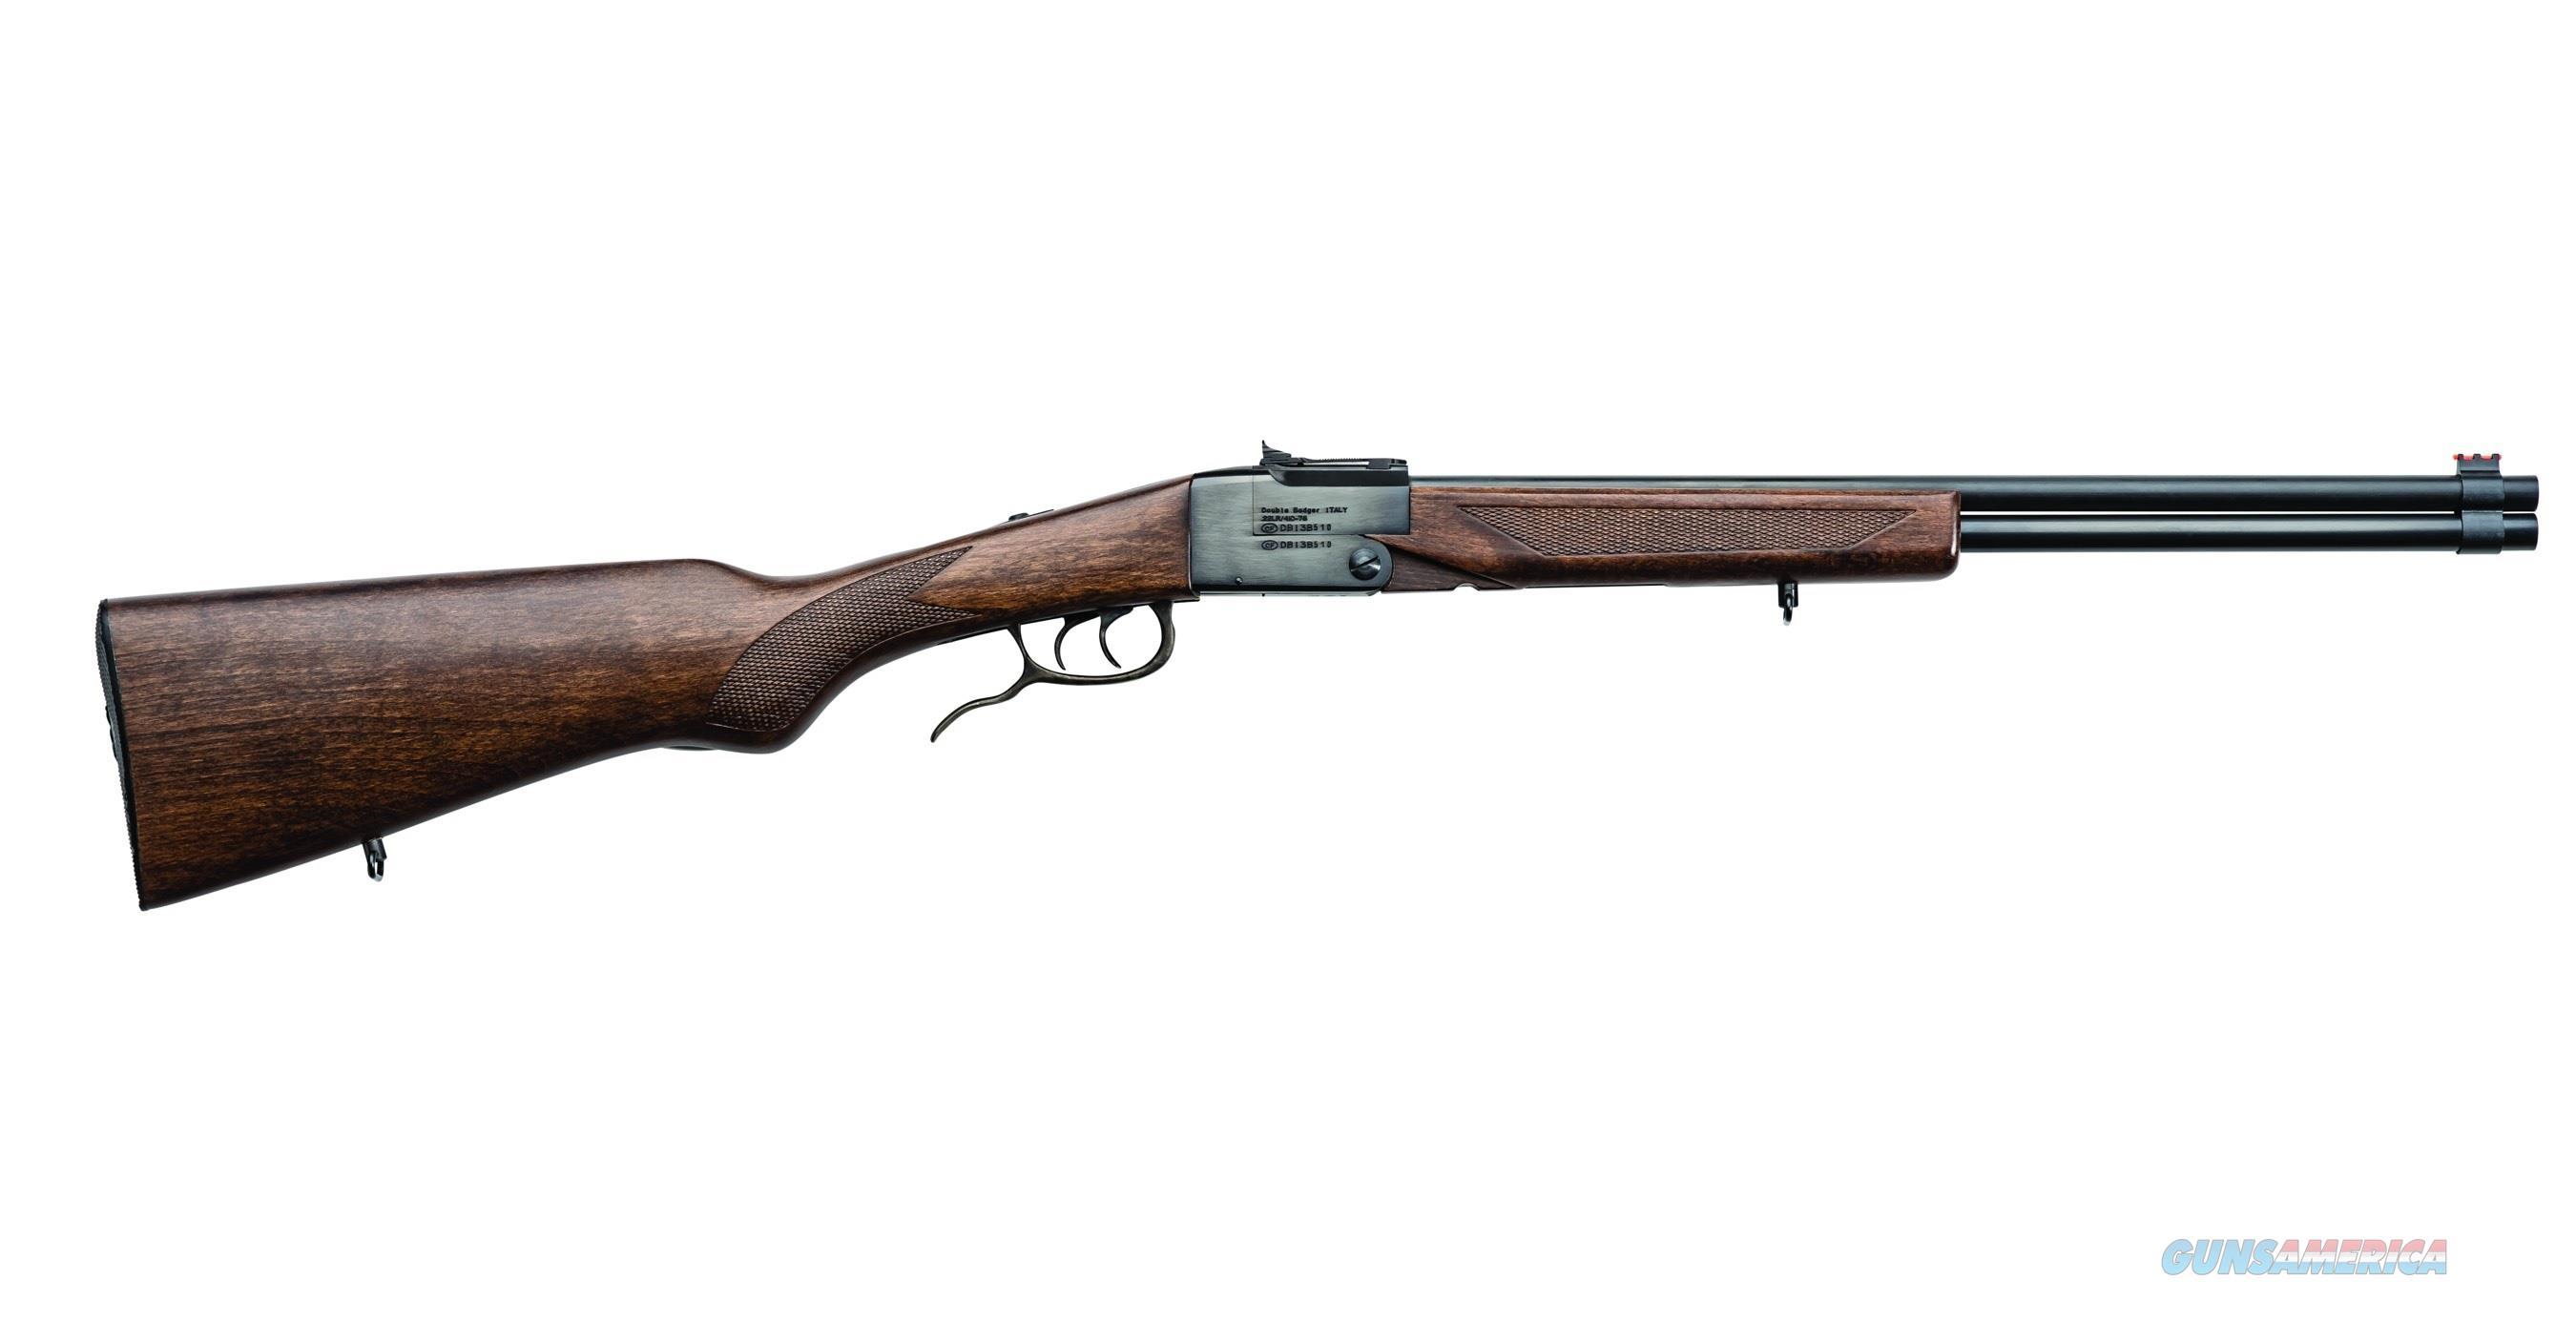 "Chiappa Double Badger .410 BORE / .22 WMR Combo 19"" 500.111  Guns > Rifles > Chiappa / Armi Sport Rifles > Hunting Rifles"